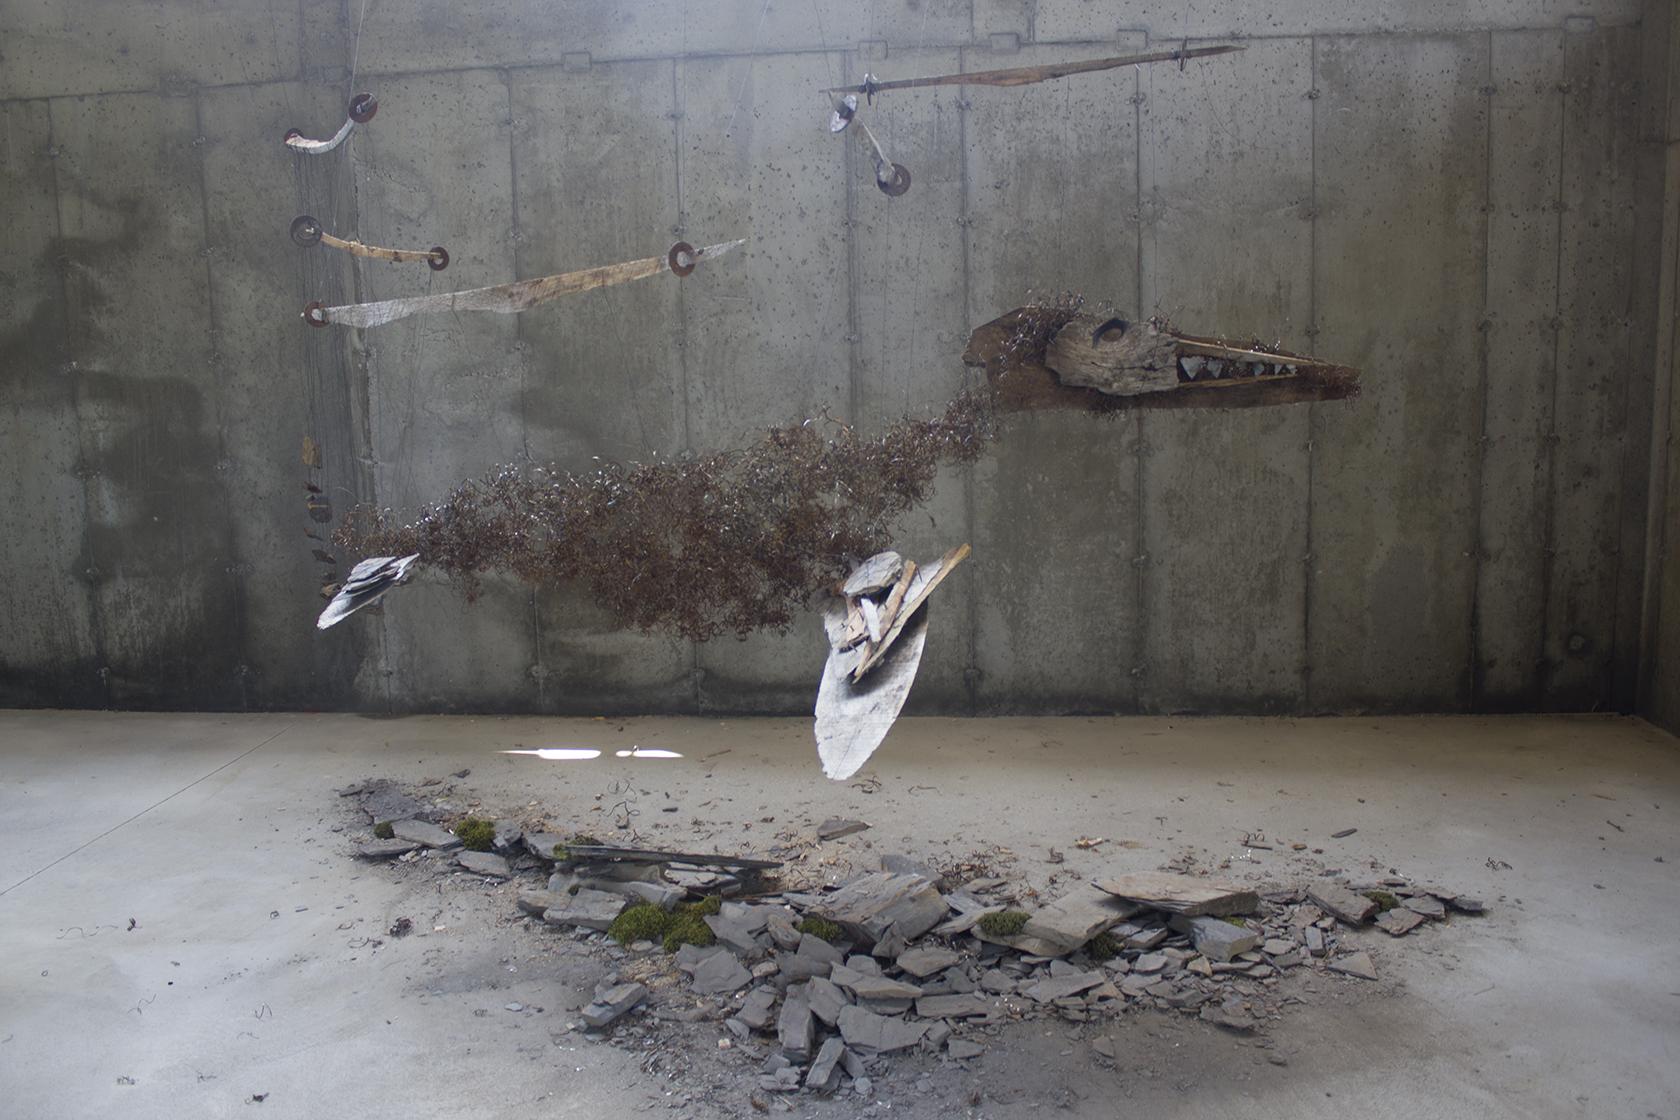 Kara Hill, Monstrum Versetur, 2014